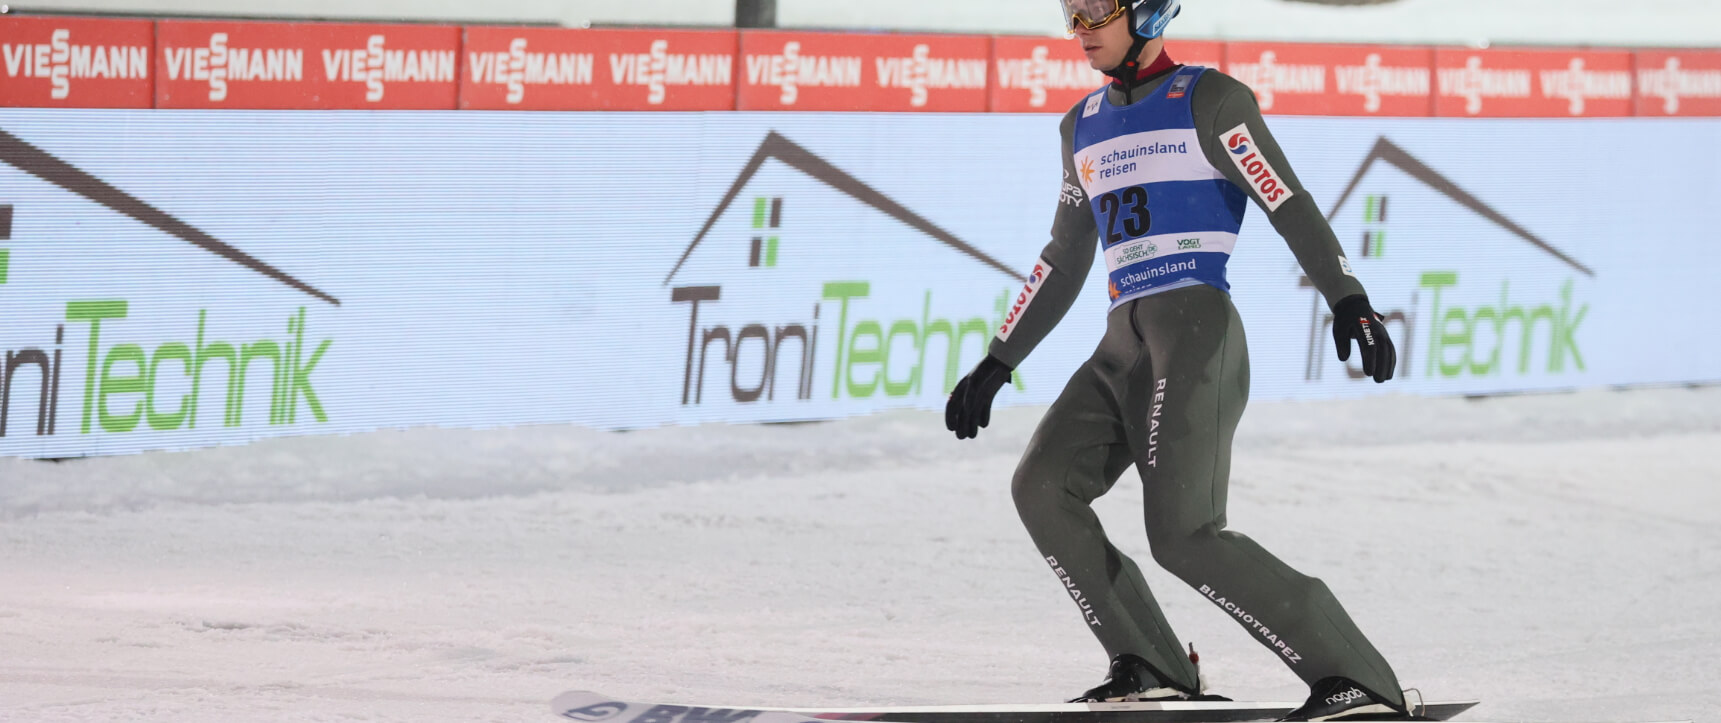 Eurosport Skispringen Weltcup TroniTechnik